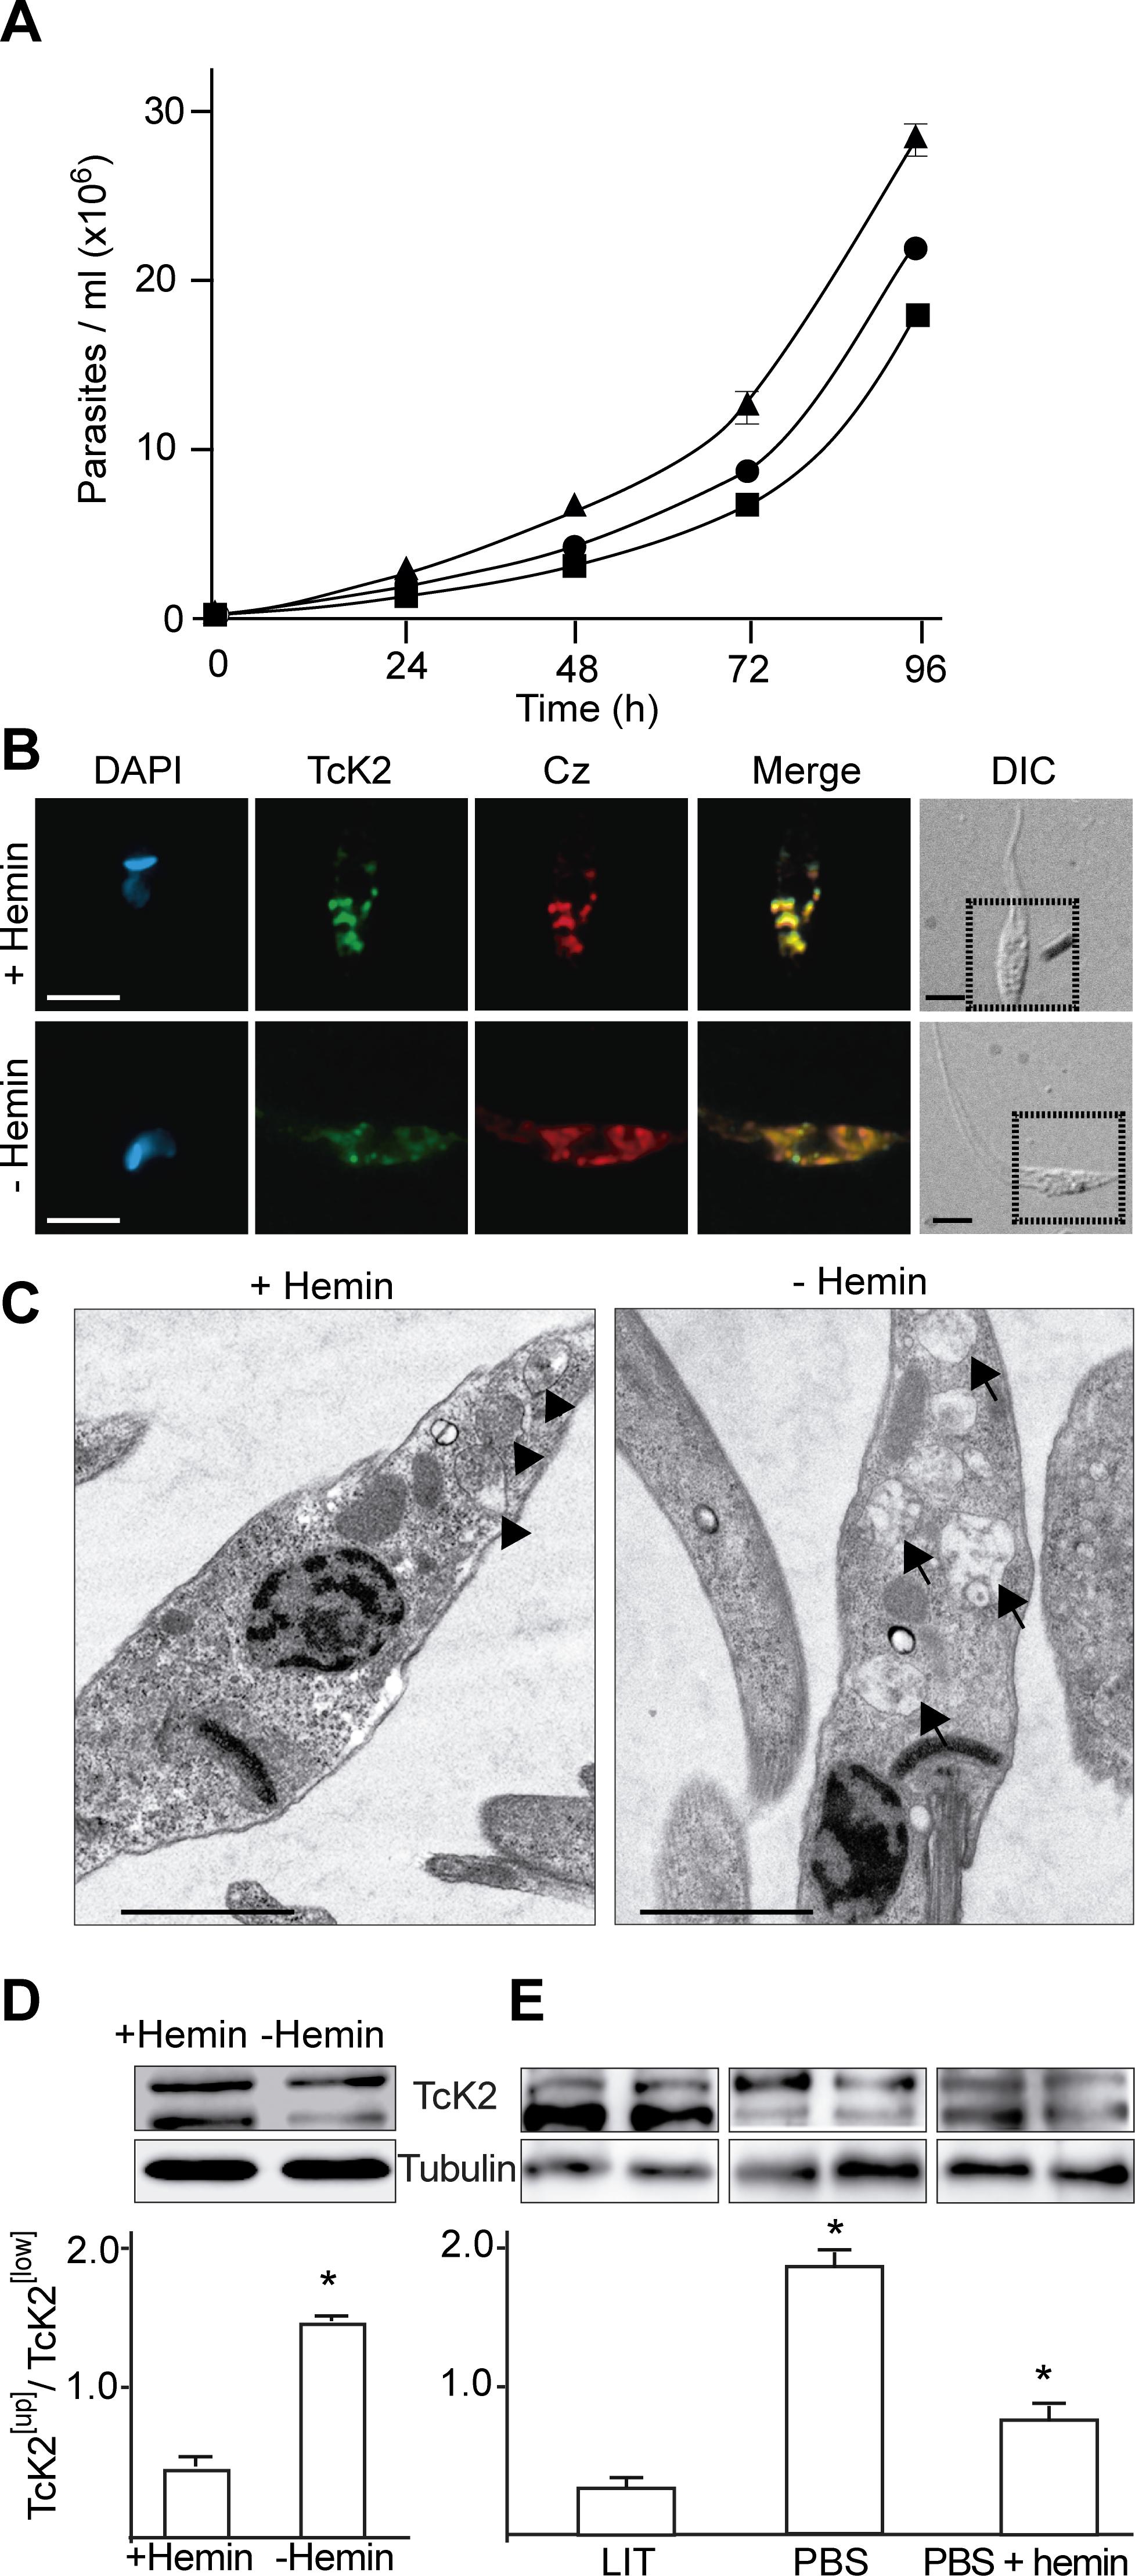 Heme promotes parasite multiplication with accumulation of electron dense endosomes and changes in TcK2 gel migration.